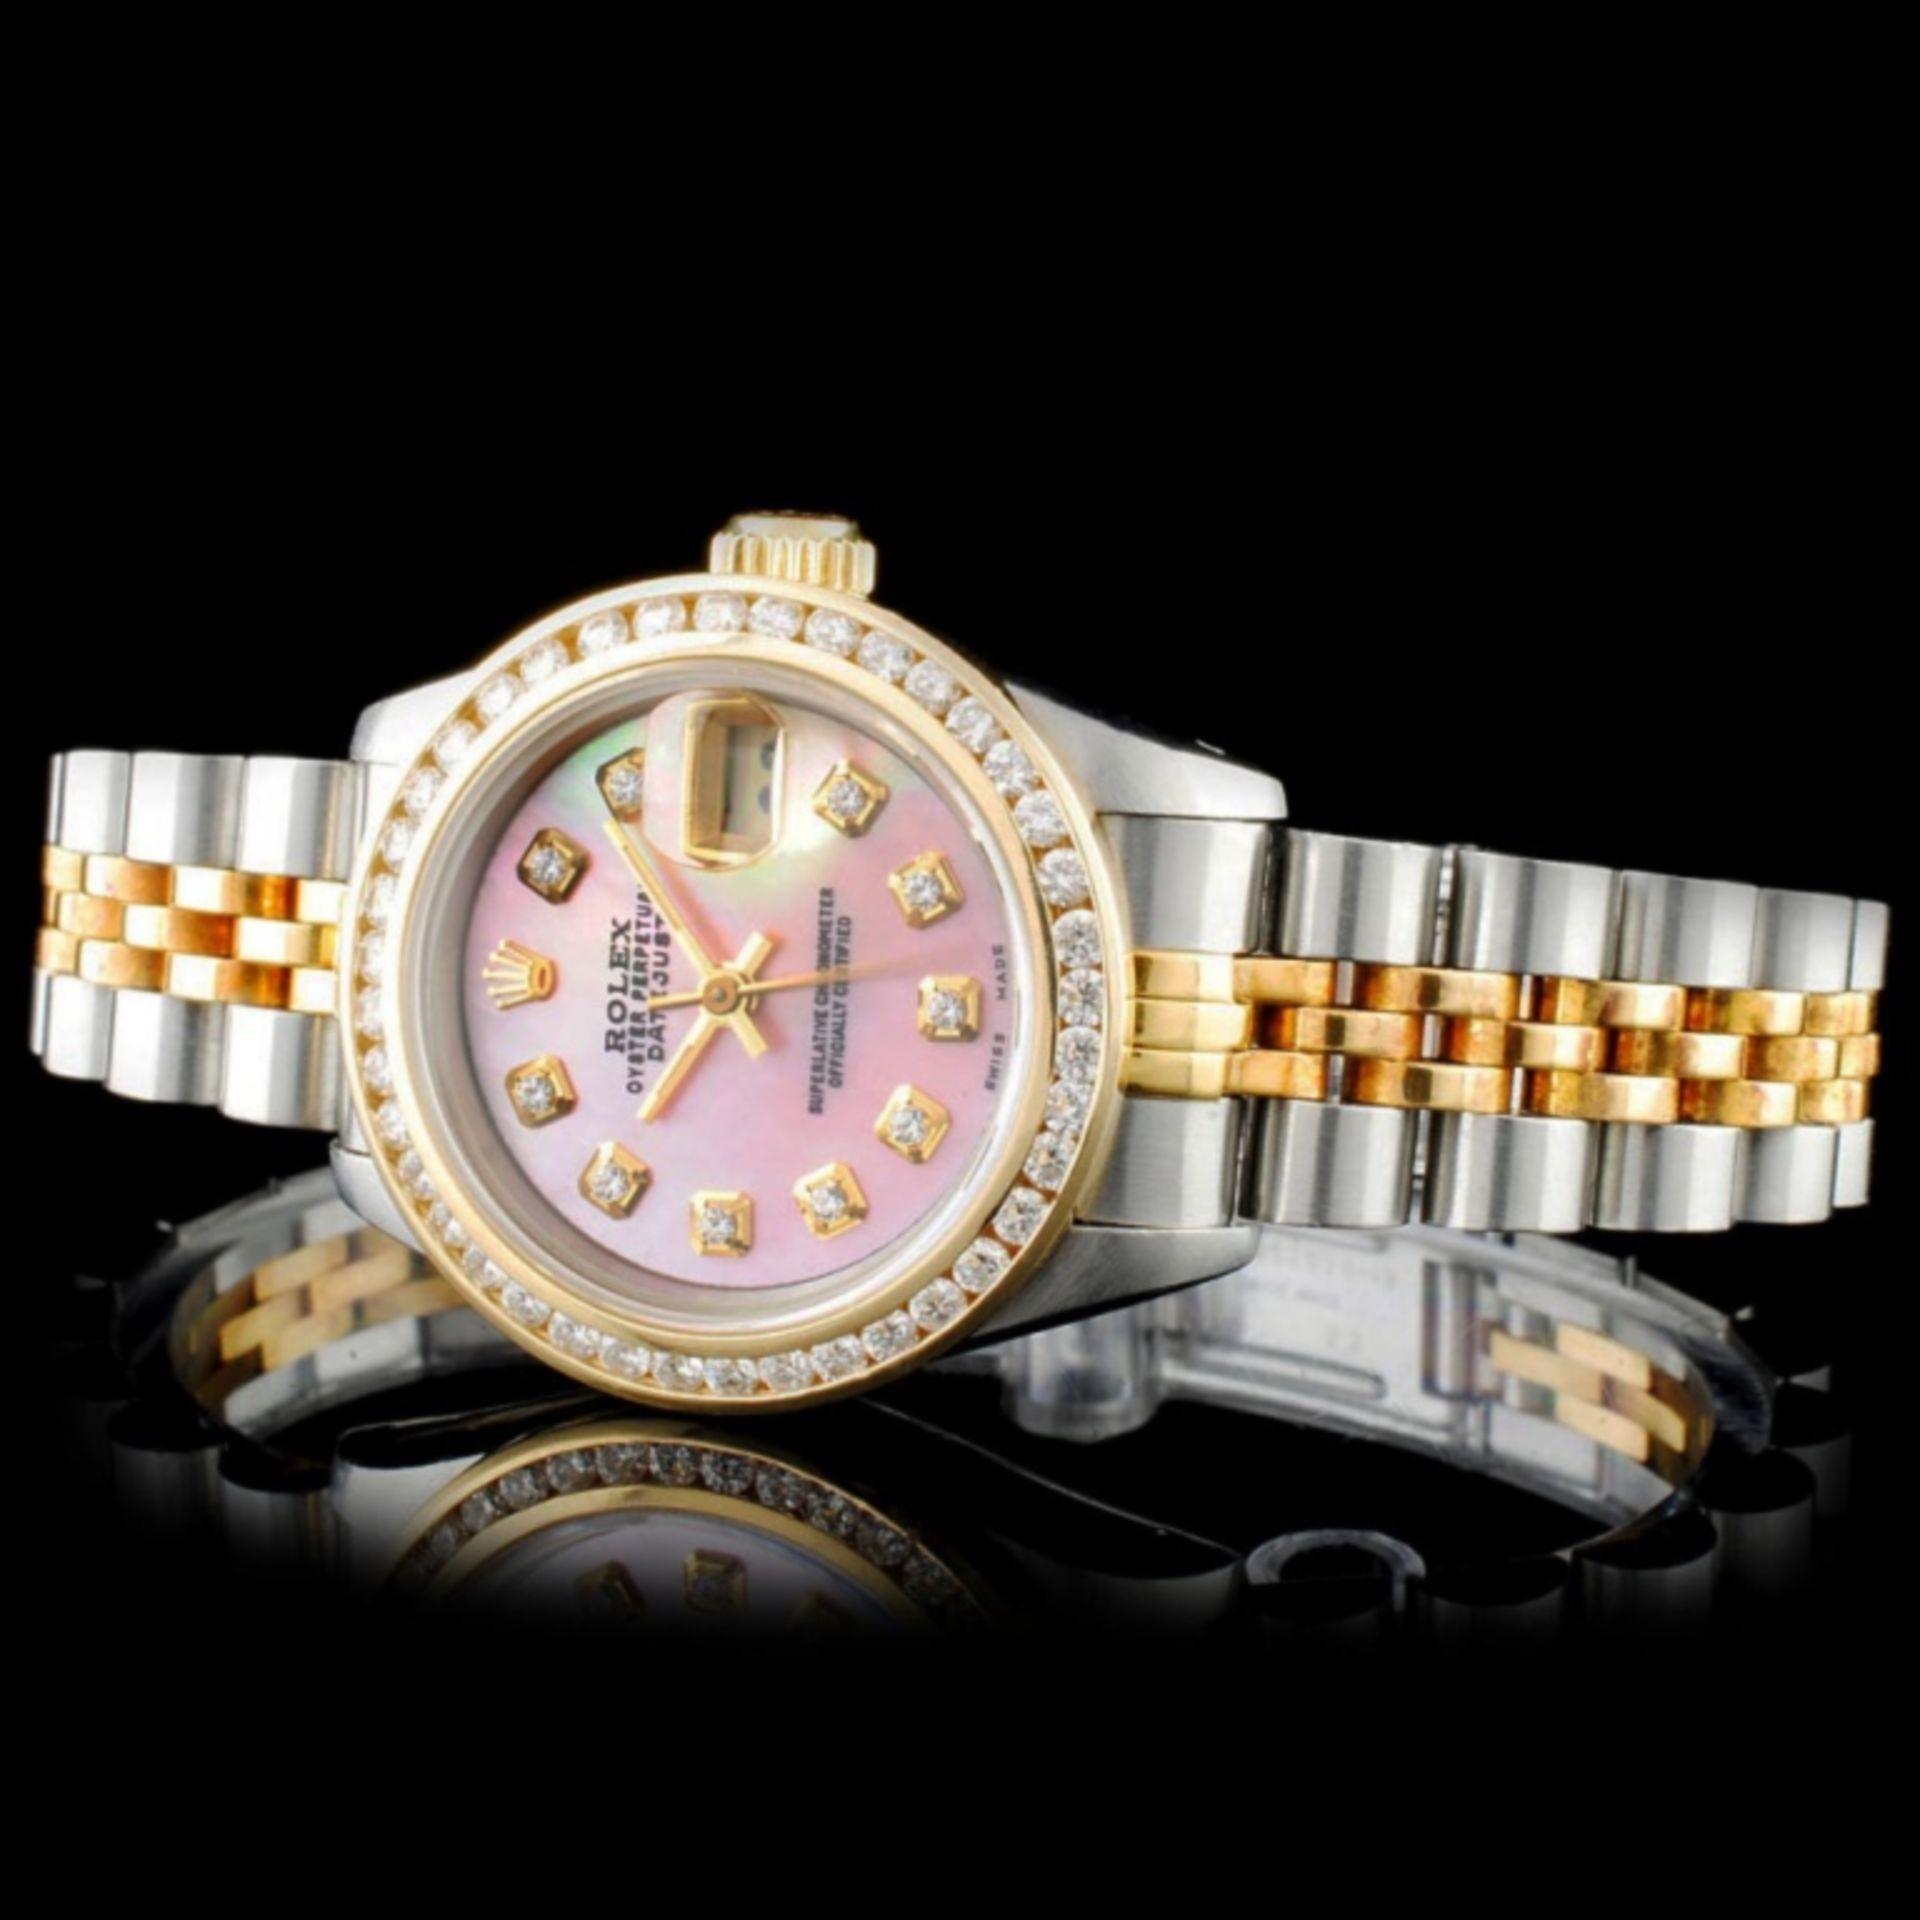 Rolex YG/SS DateJust Diamond Ladies Wristwa - Image 2 of 5